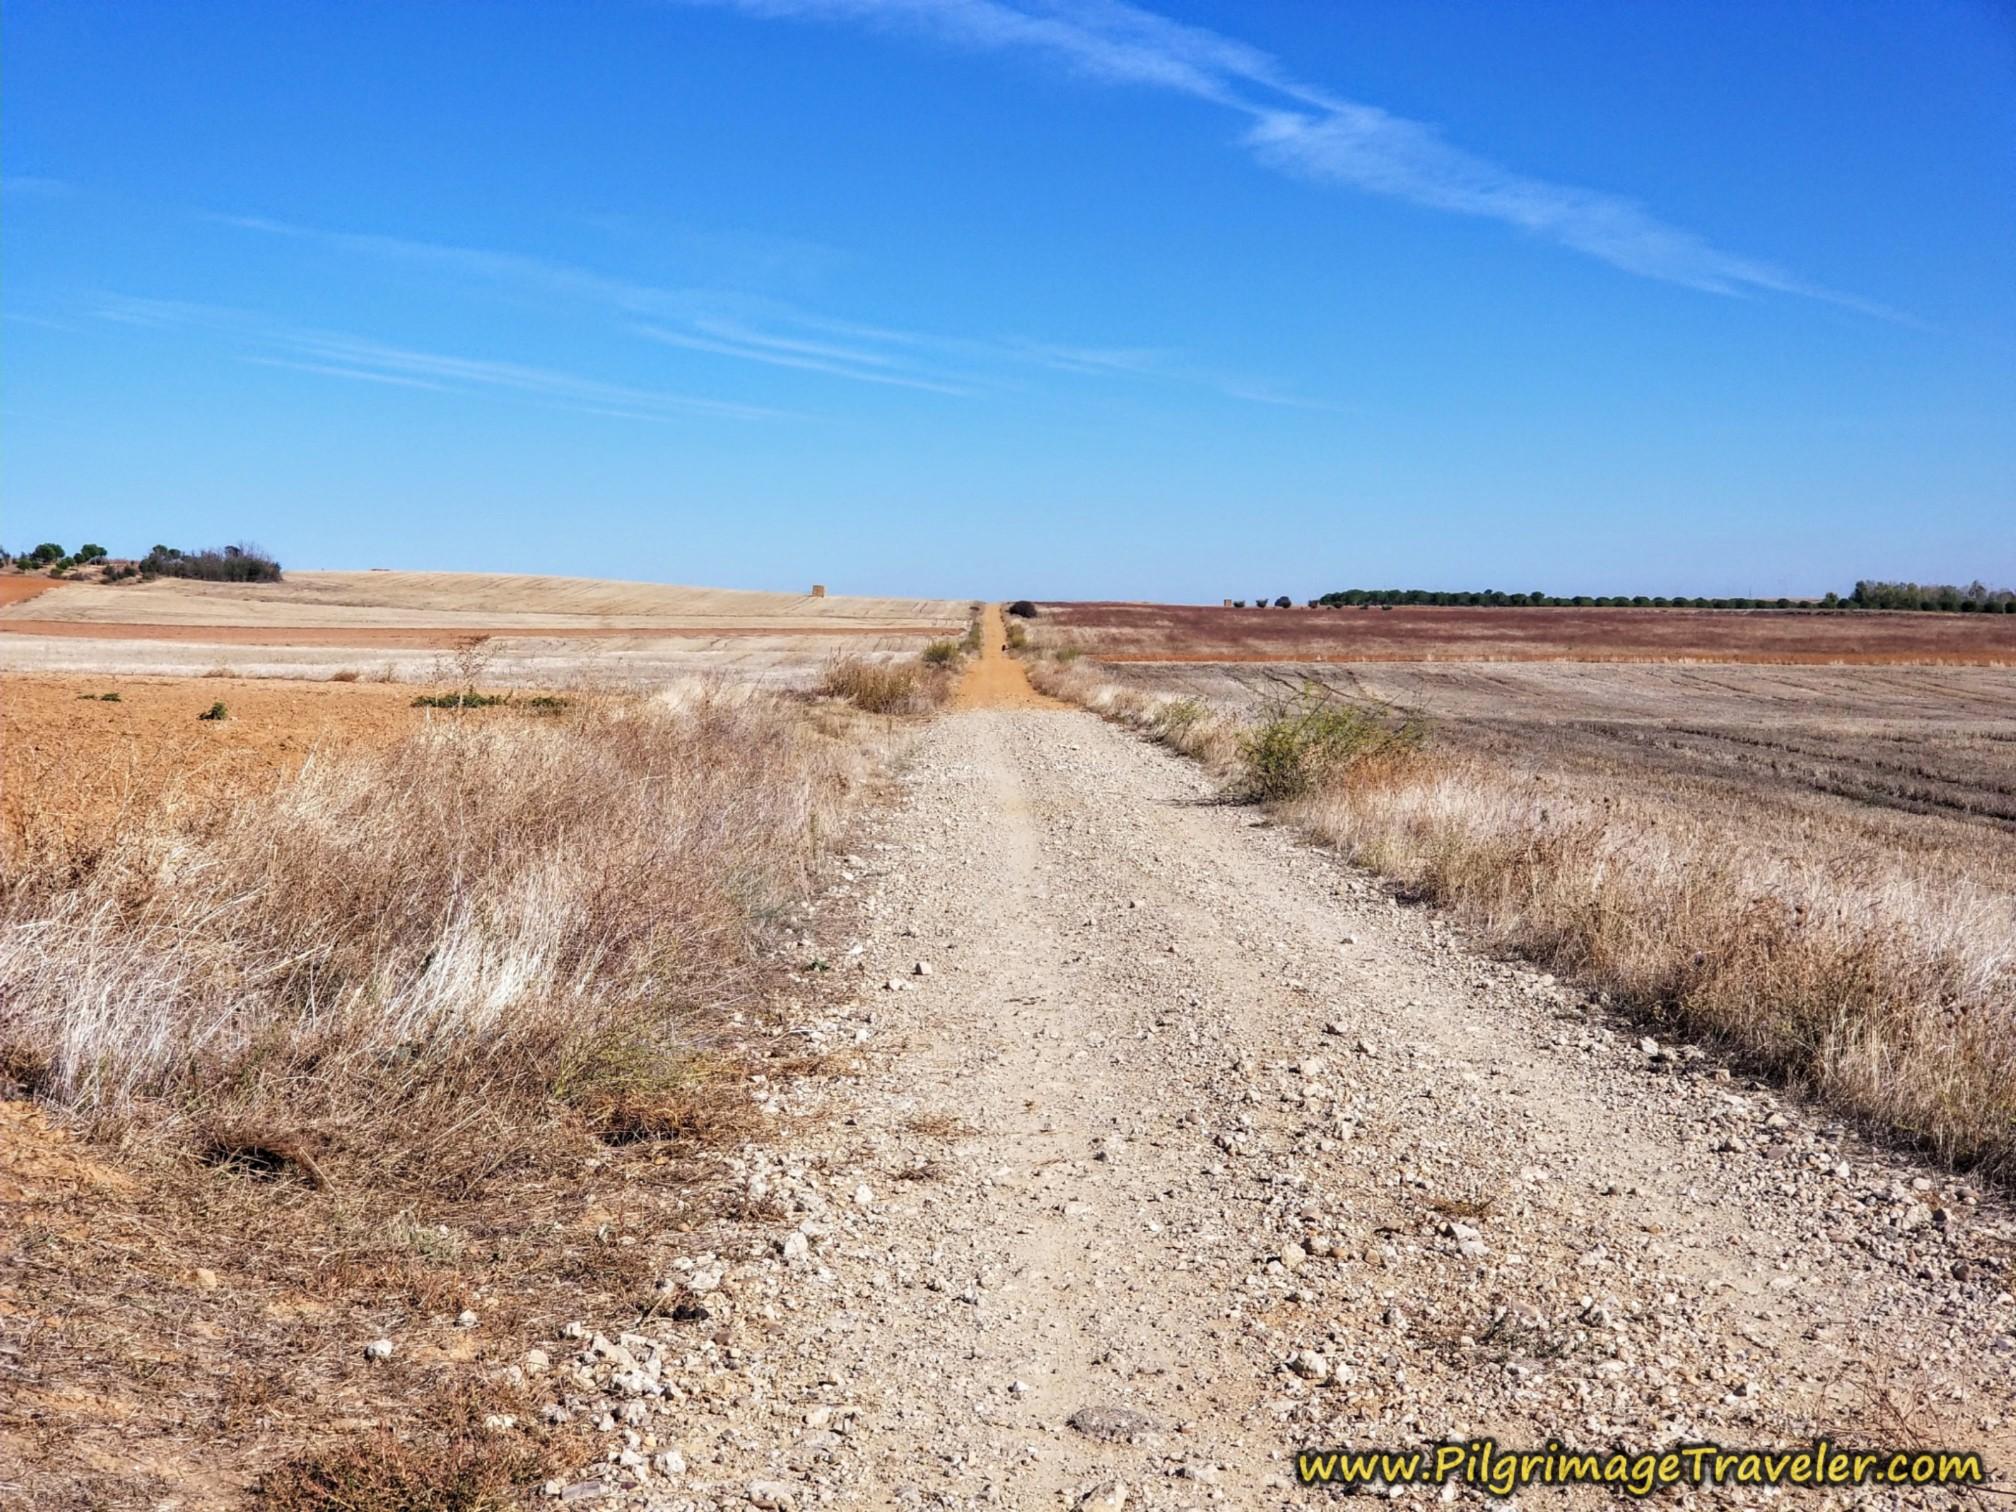 Long Hot Road Ahead on the Vía de la Plata from Montamarta to Granja de Moreruela